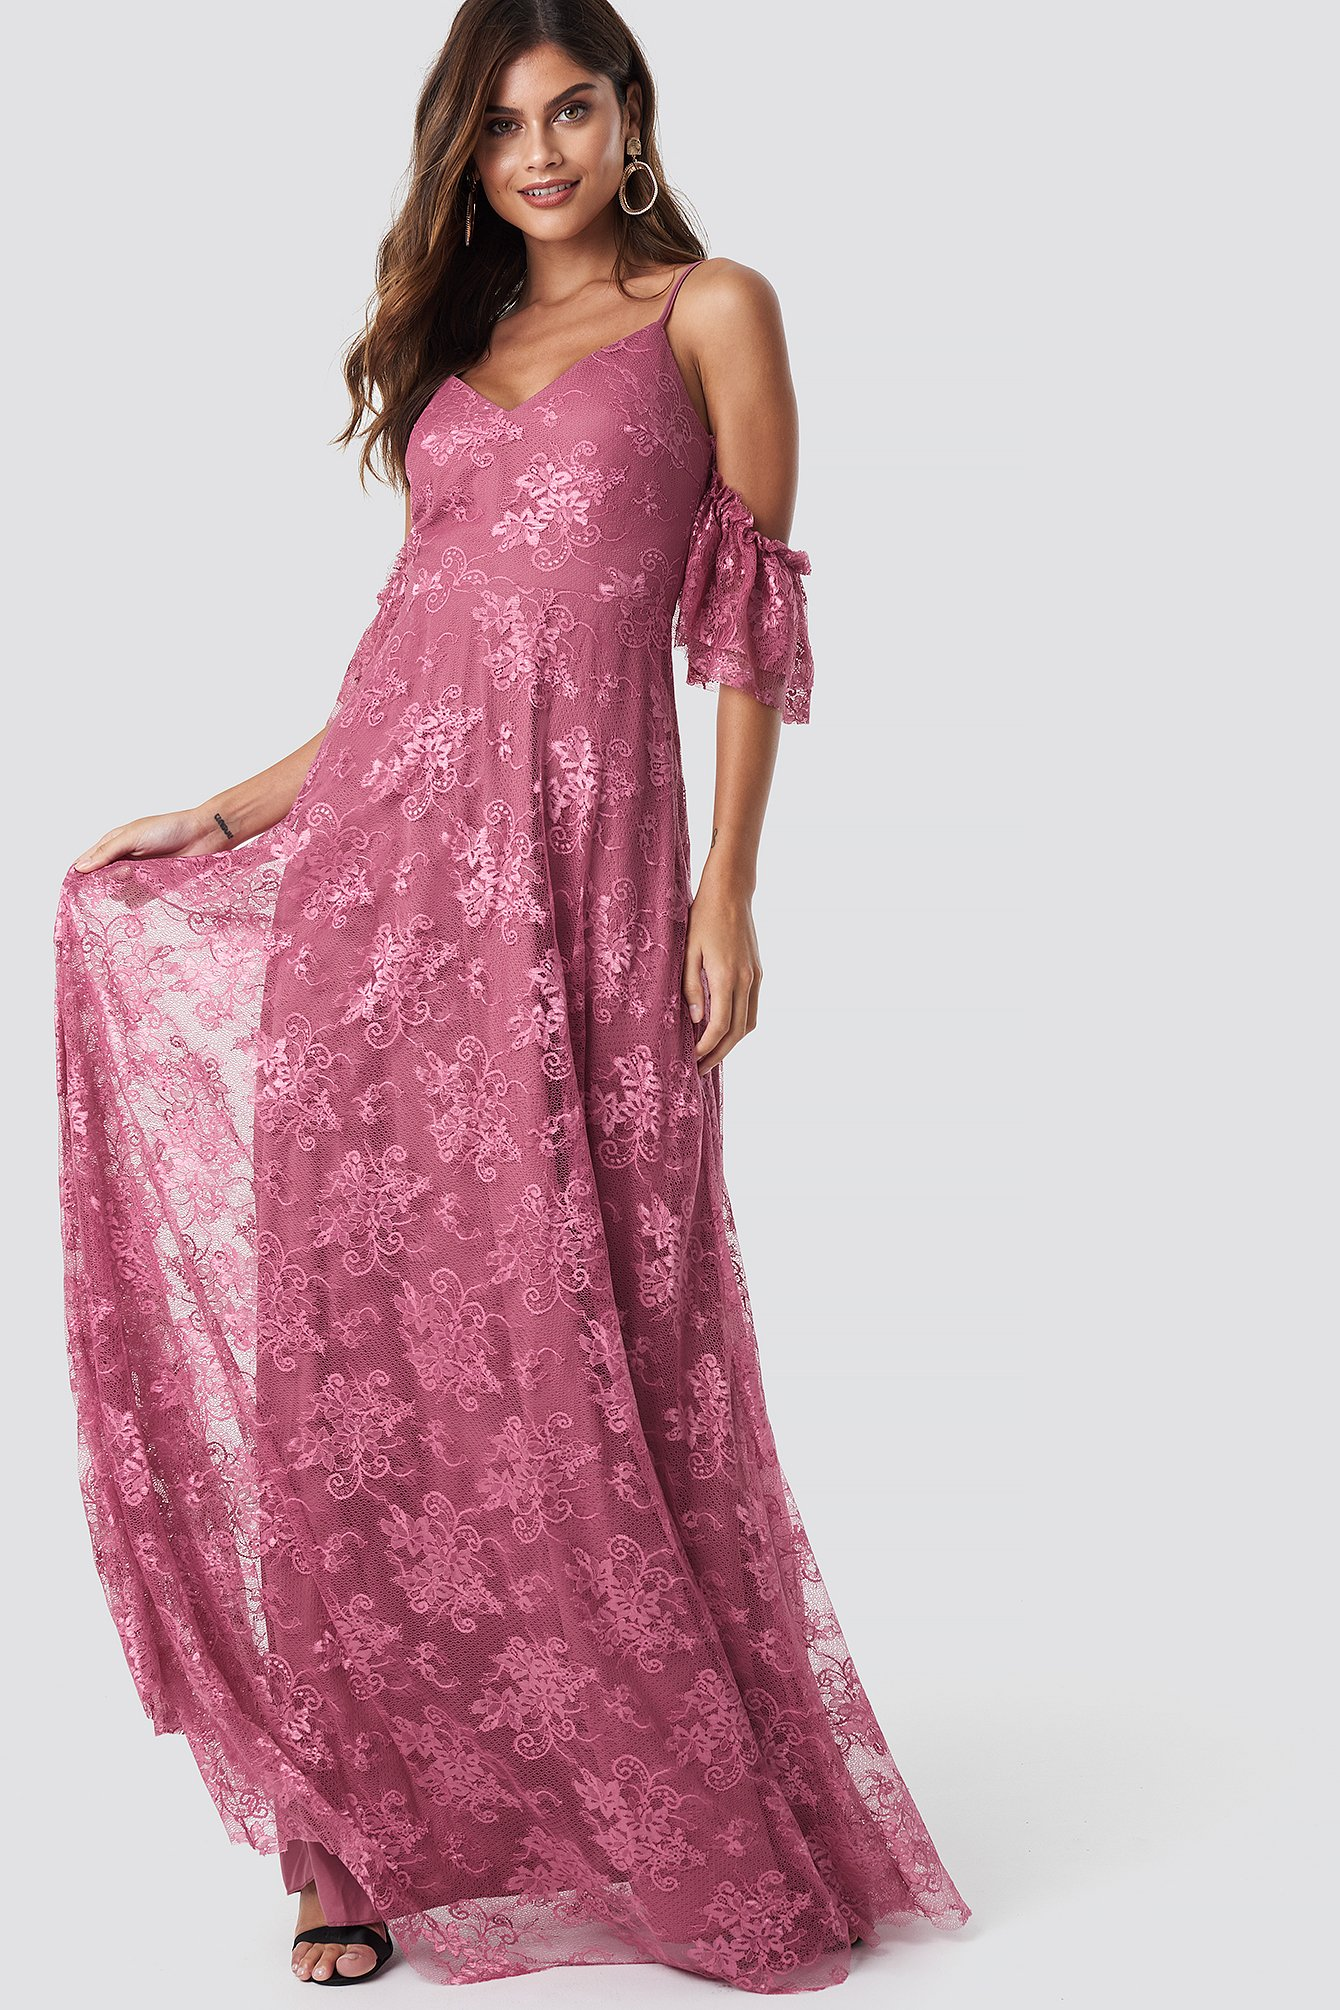 TRENDYOL ROSE DRY MAXI DRESS - PINK